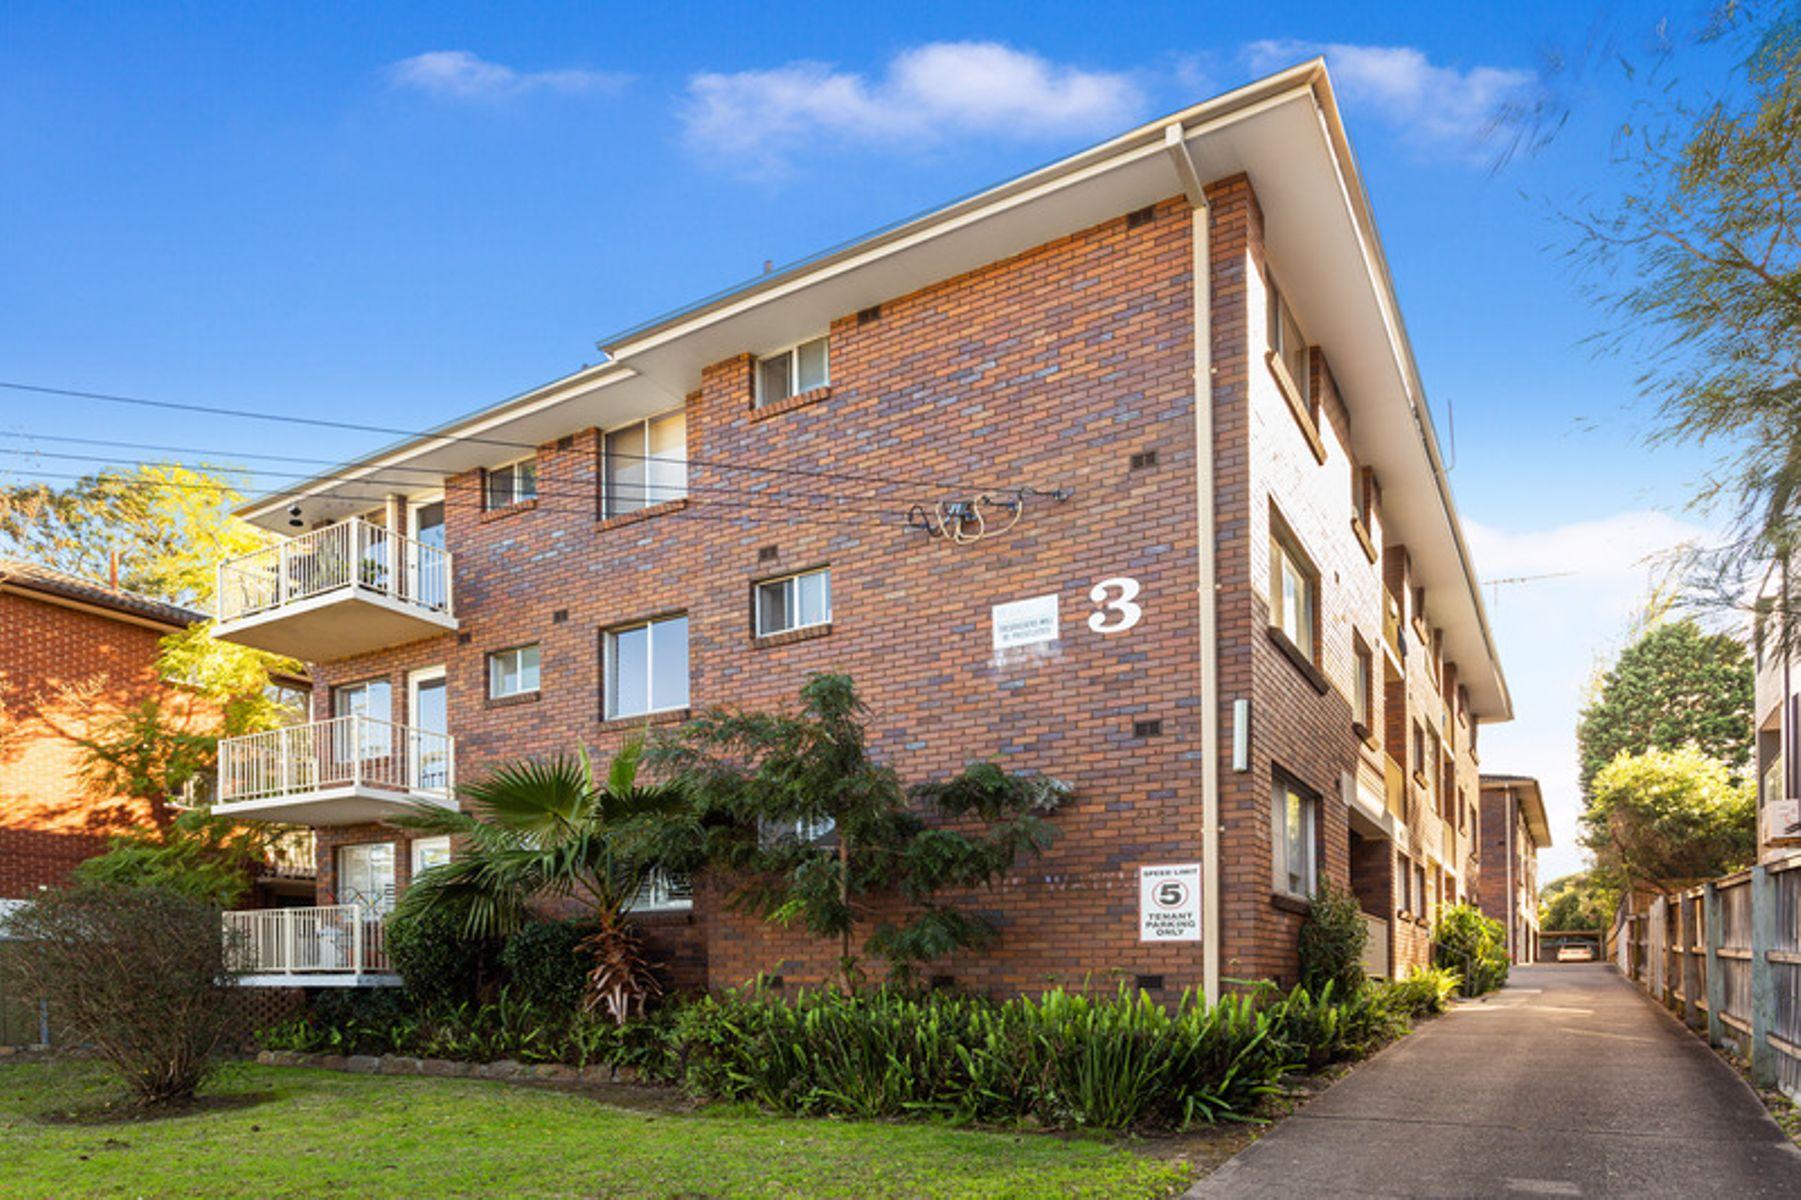 8/3 Calder Street, Dundas, NSW 2117